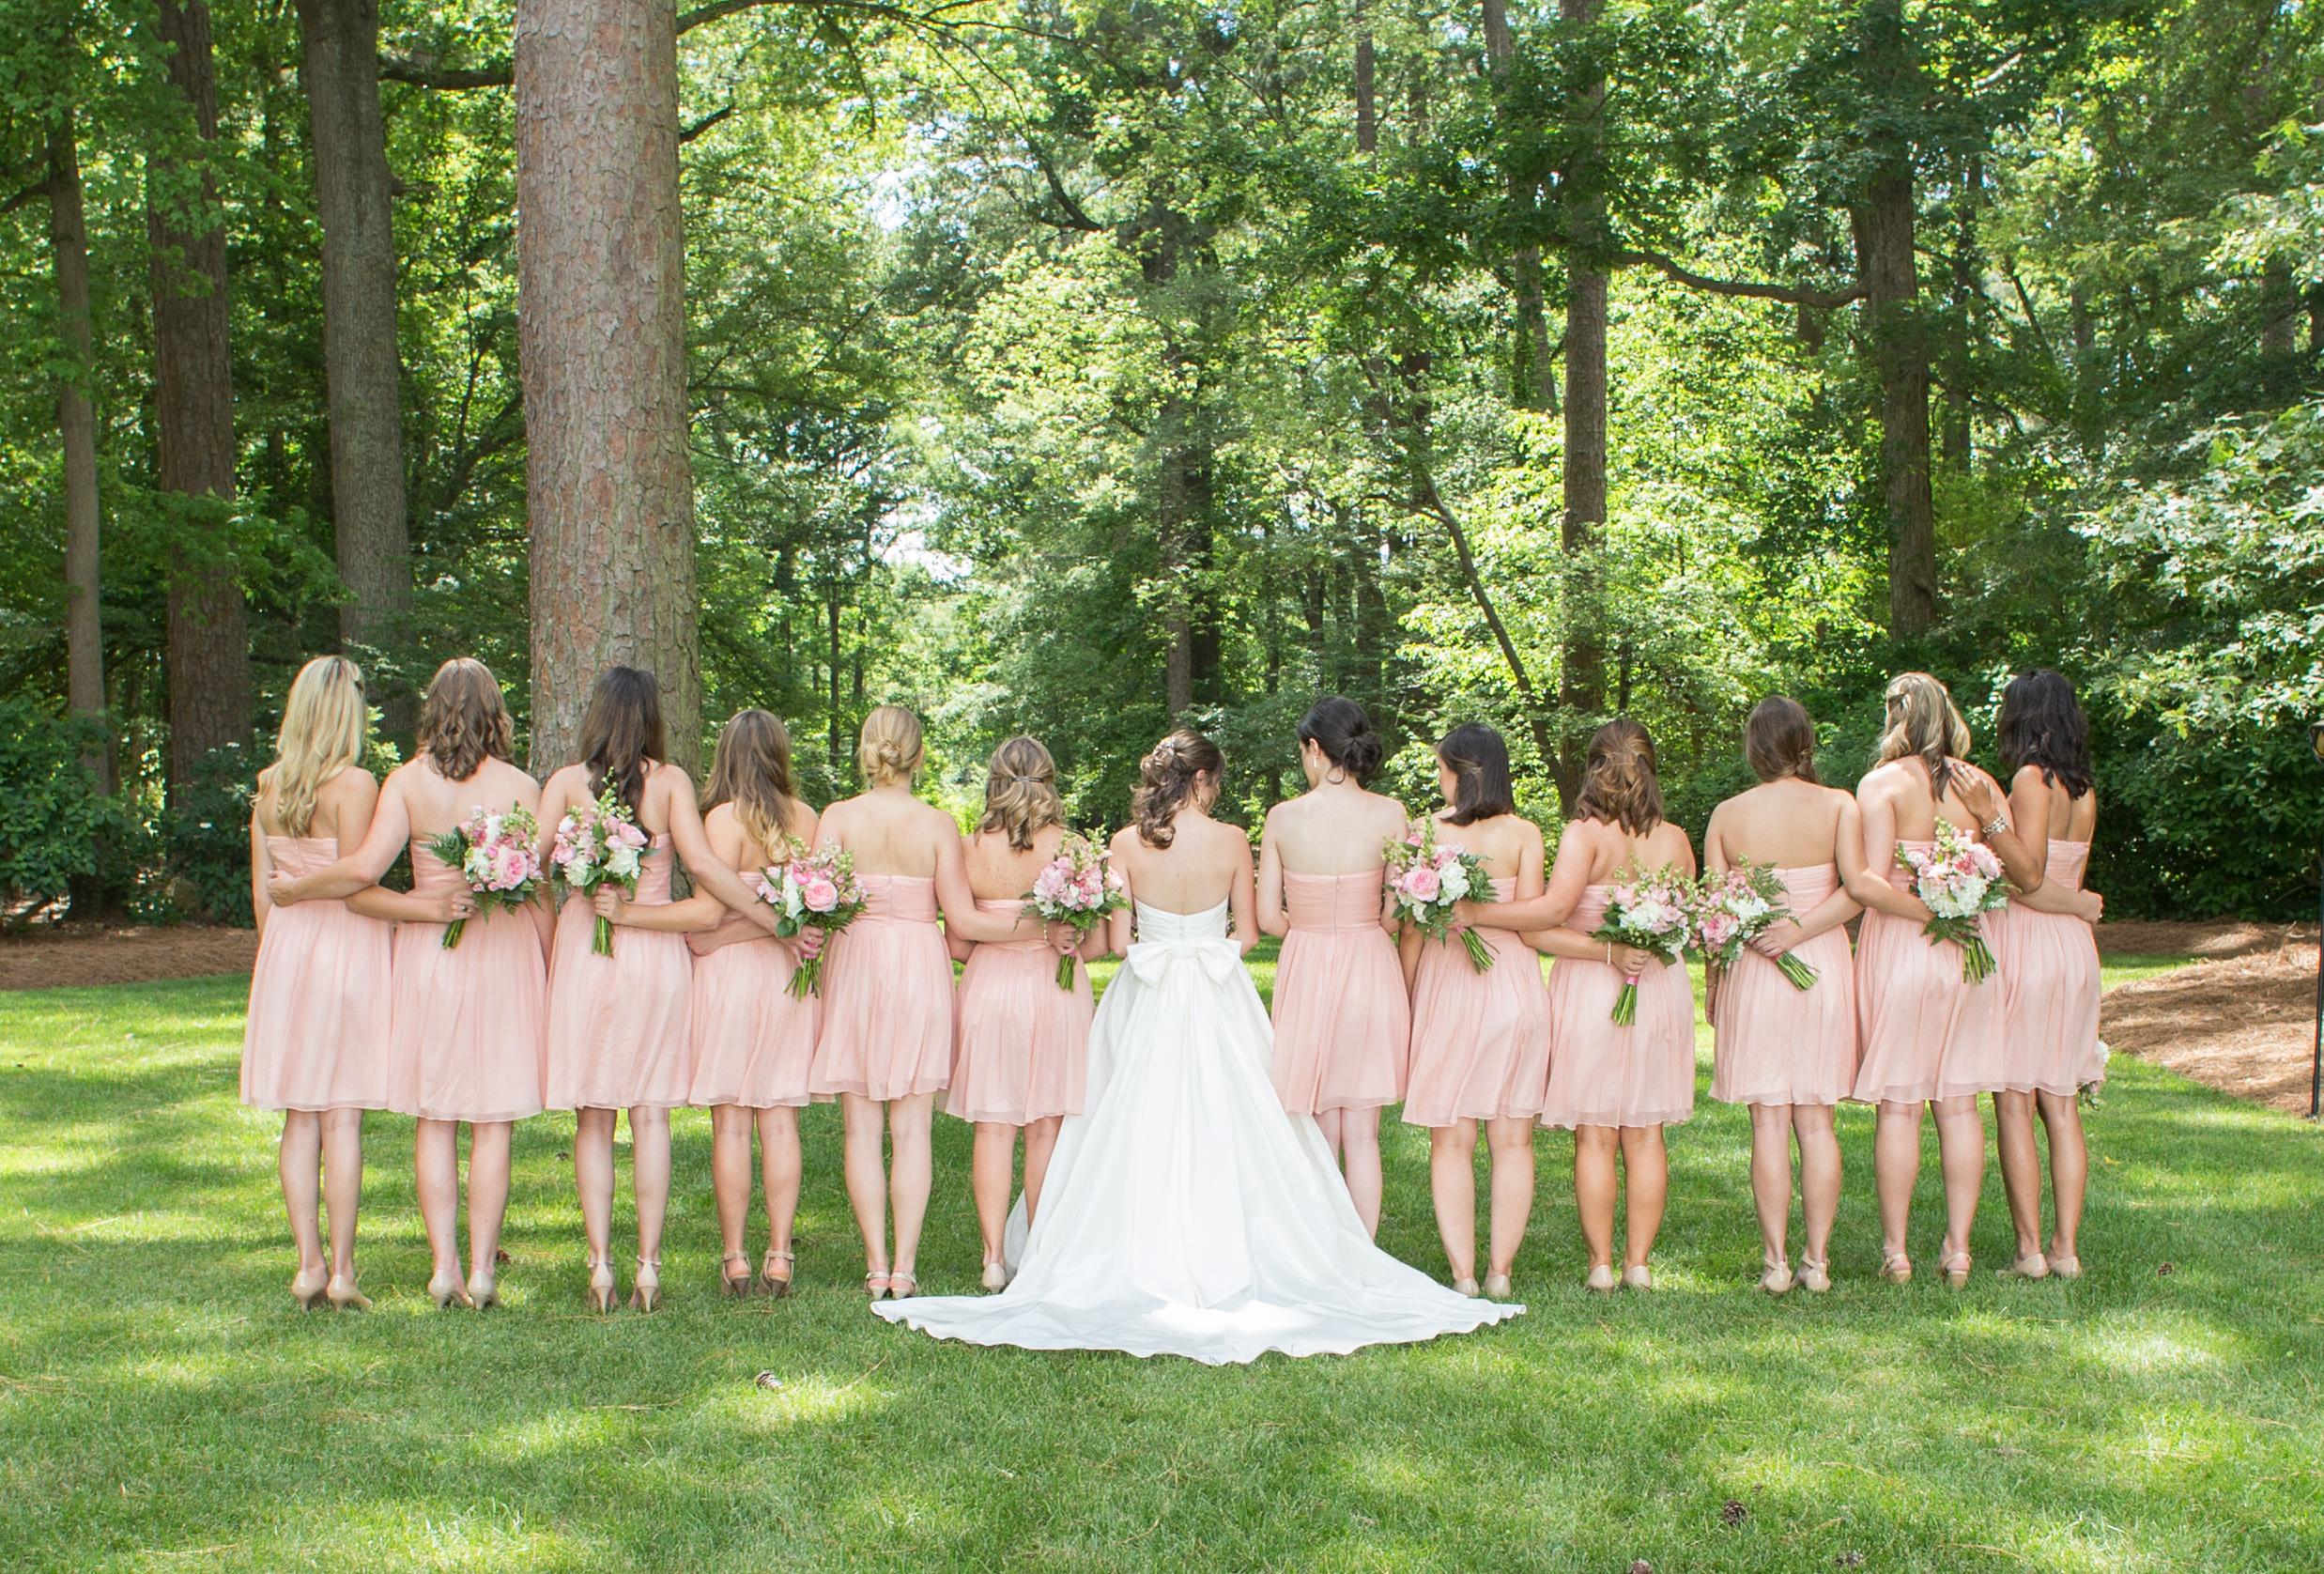 wedding 8 (1 of 1).jpg